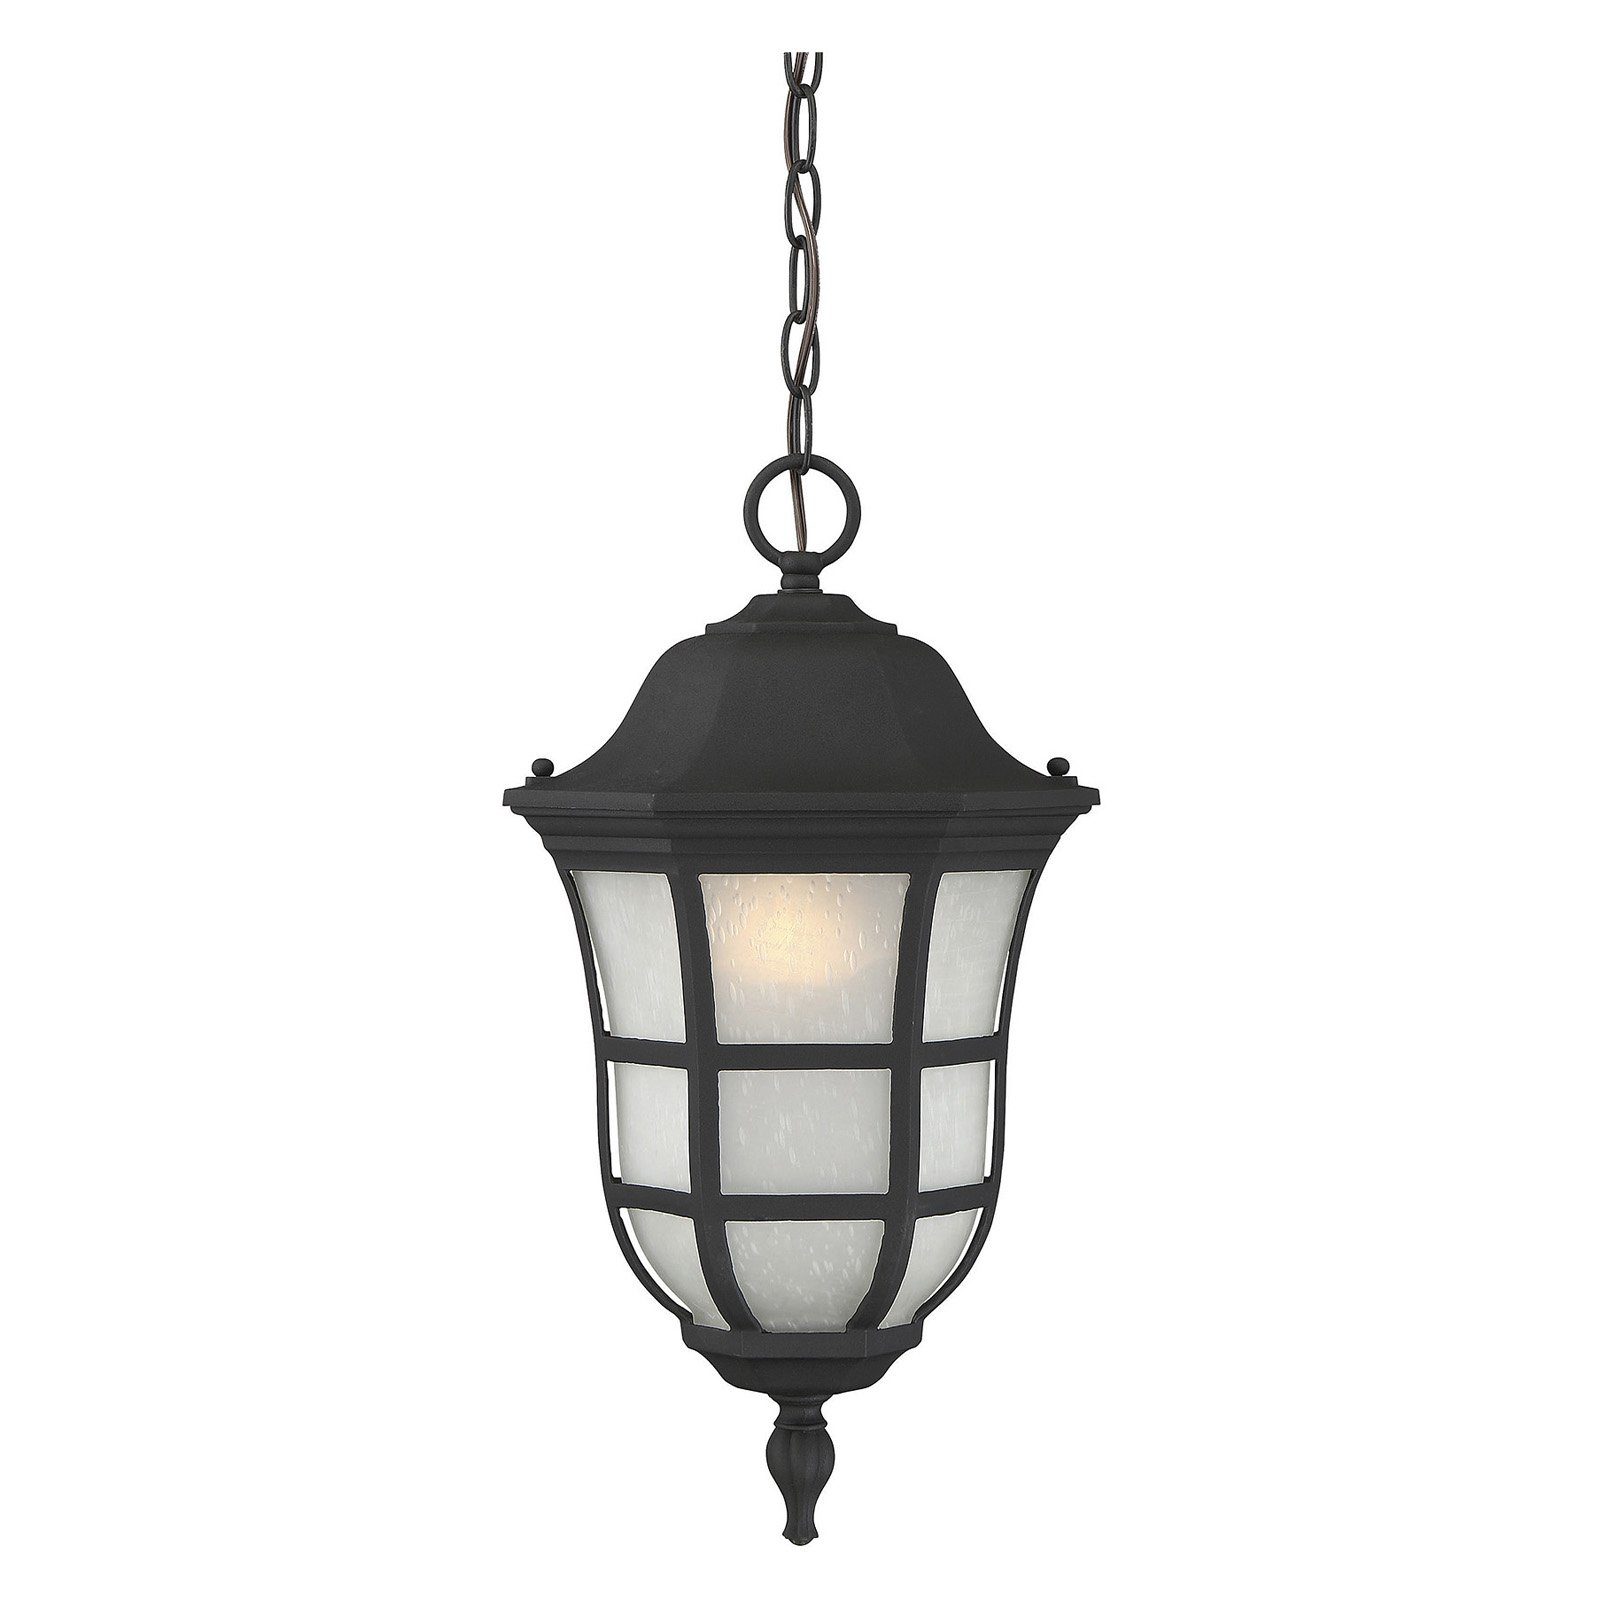 Savoy House Ashburn 5-482-BK Outdoor Hanging Lantern by Savoy House